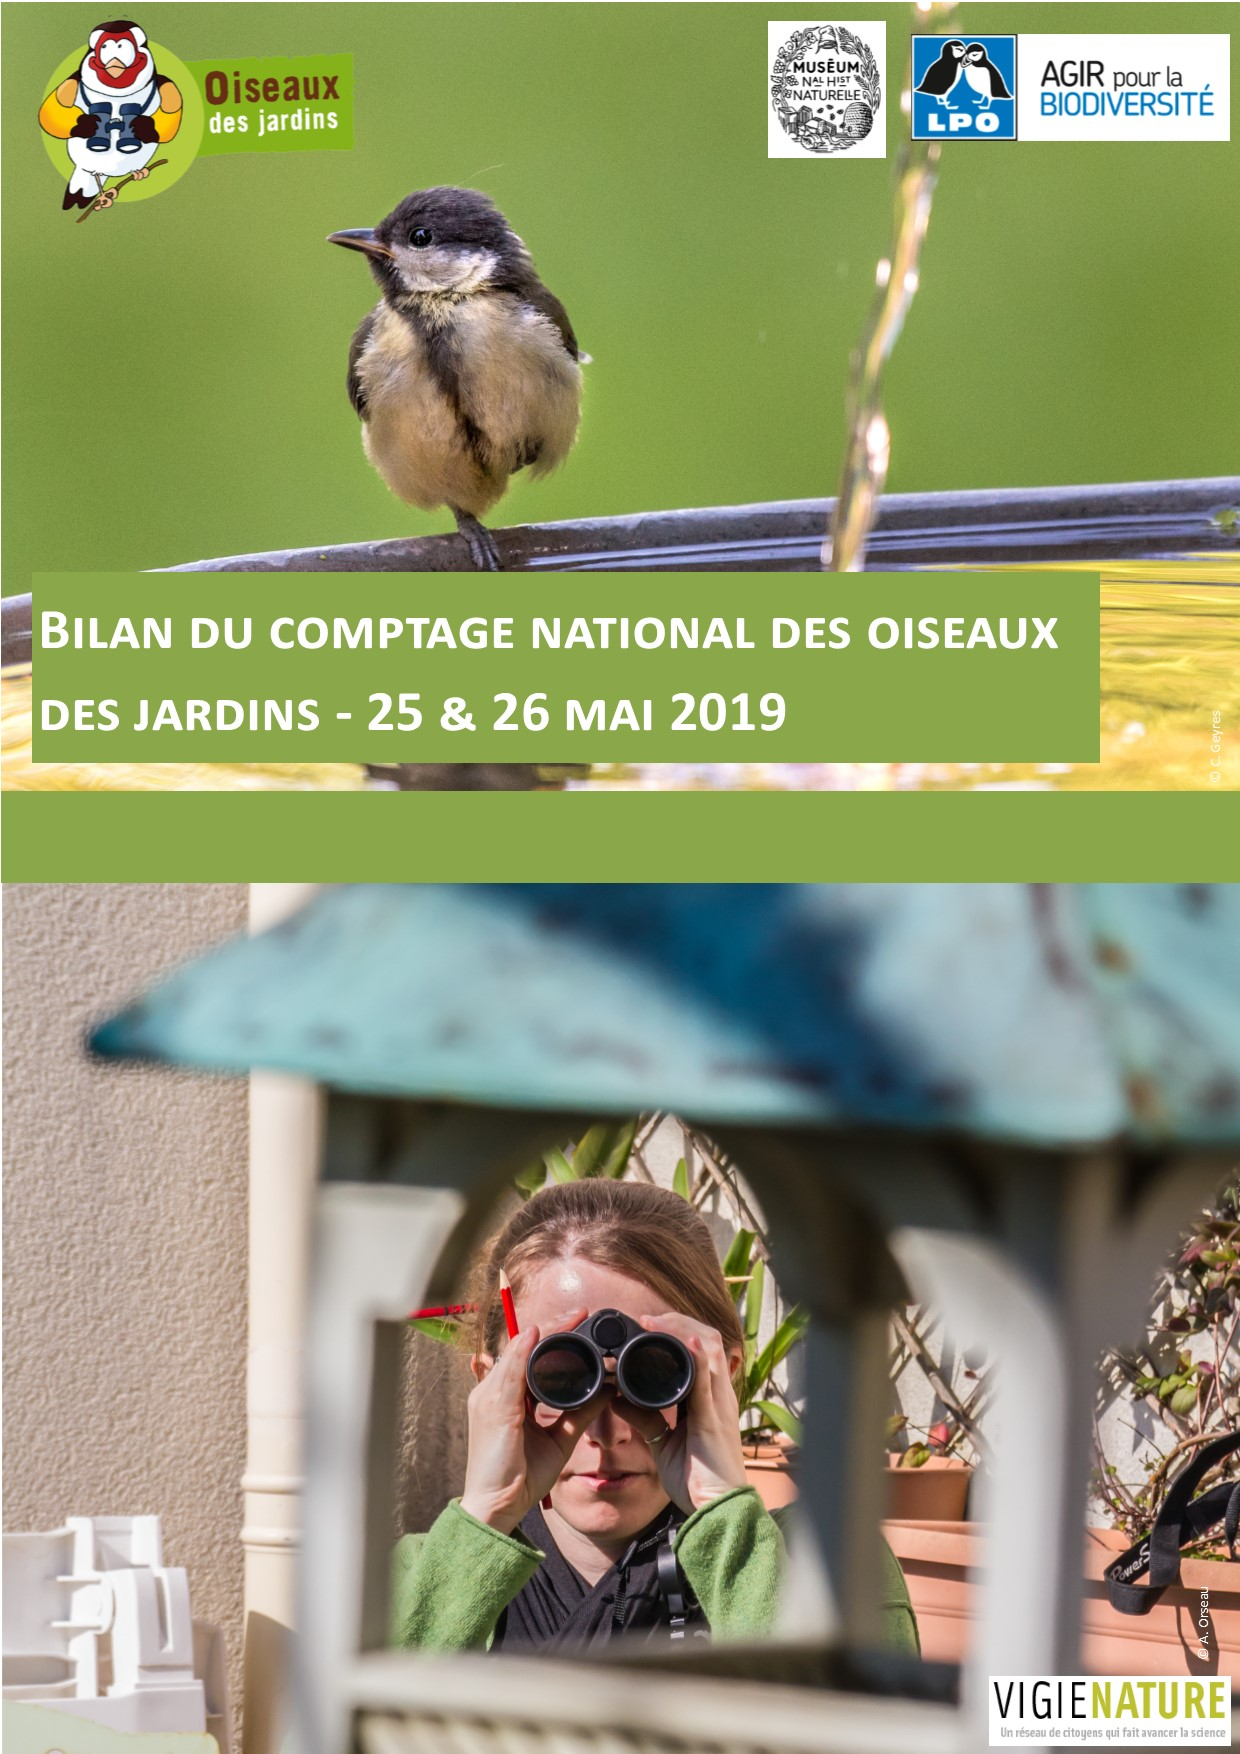 https://cdnfiles2.biolovision.net/www.oiseauxdesjardins.fr/userfiles/Bilancomptageodjmai2019cps.jpg